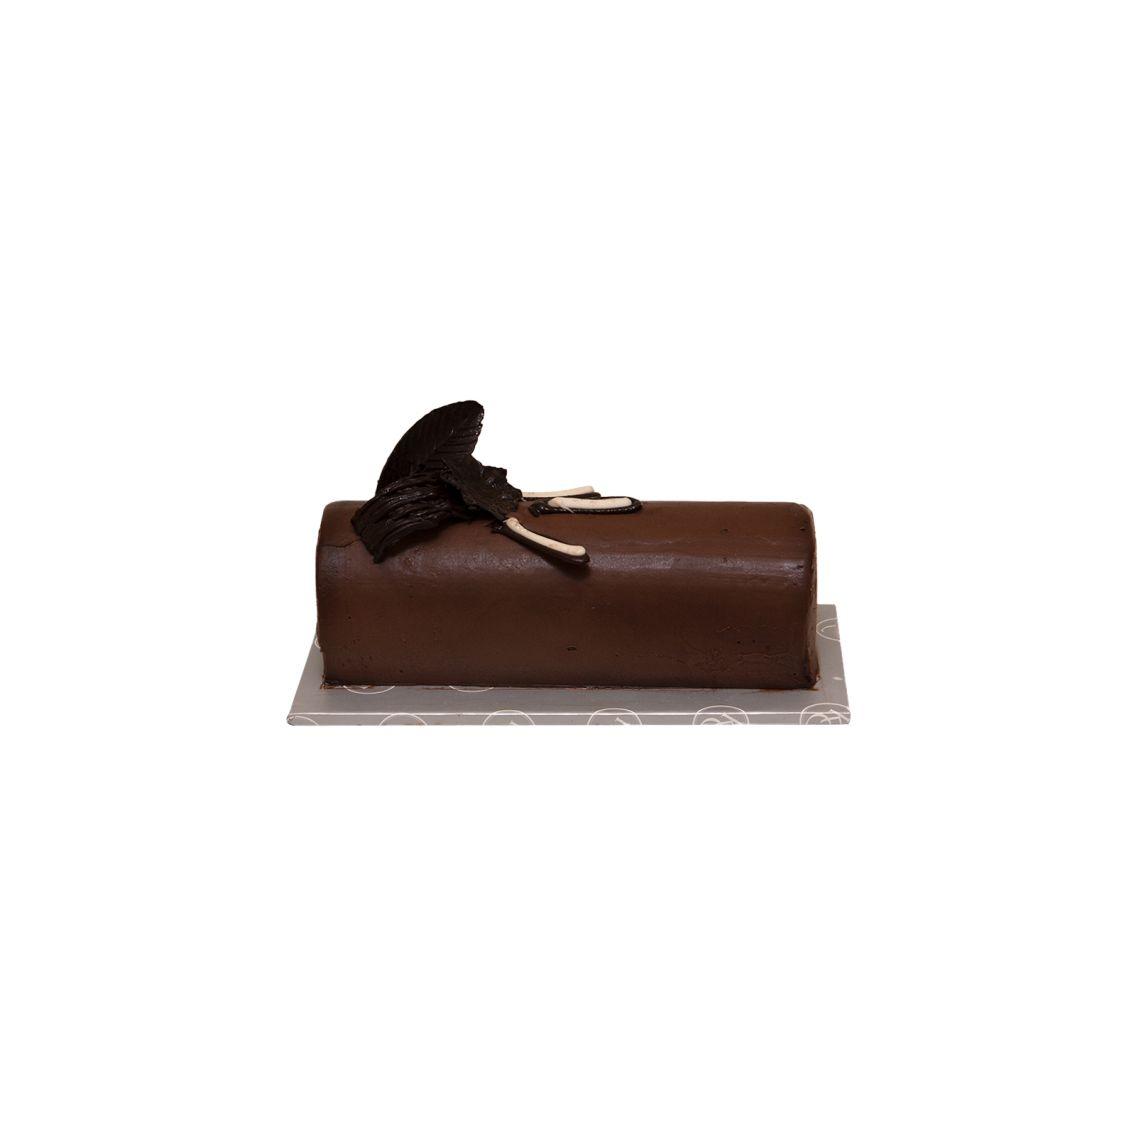 Kitchen Cuisine Default Category Chocolate Mousse Log